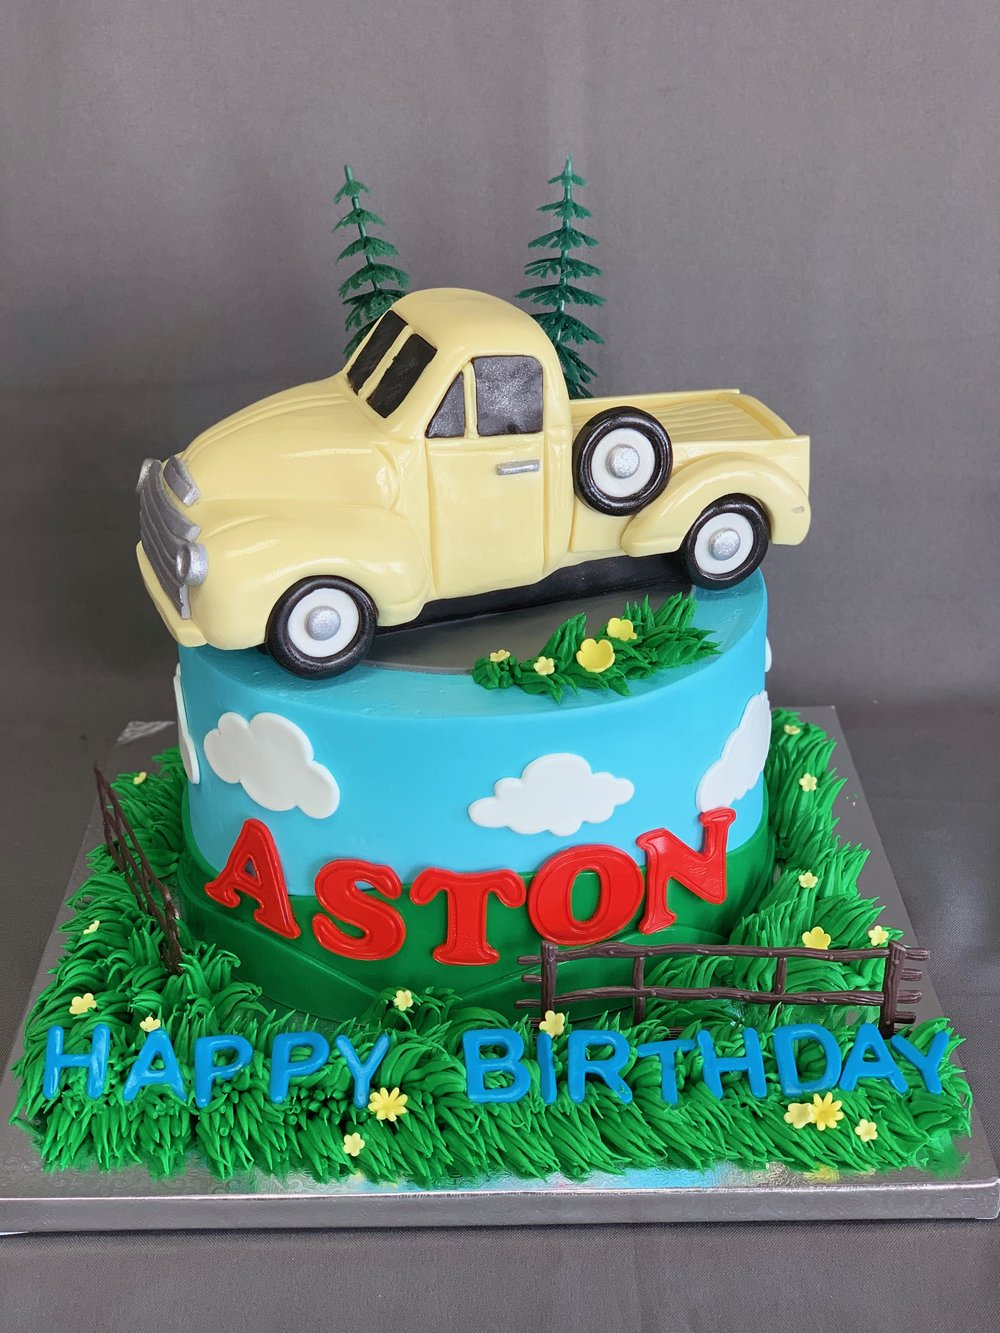 Baby Horse Cake Skazka Desserts Bakery Nj Custom Birthday Cakes Cupcakes Shop